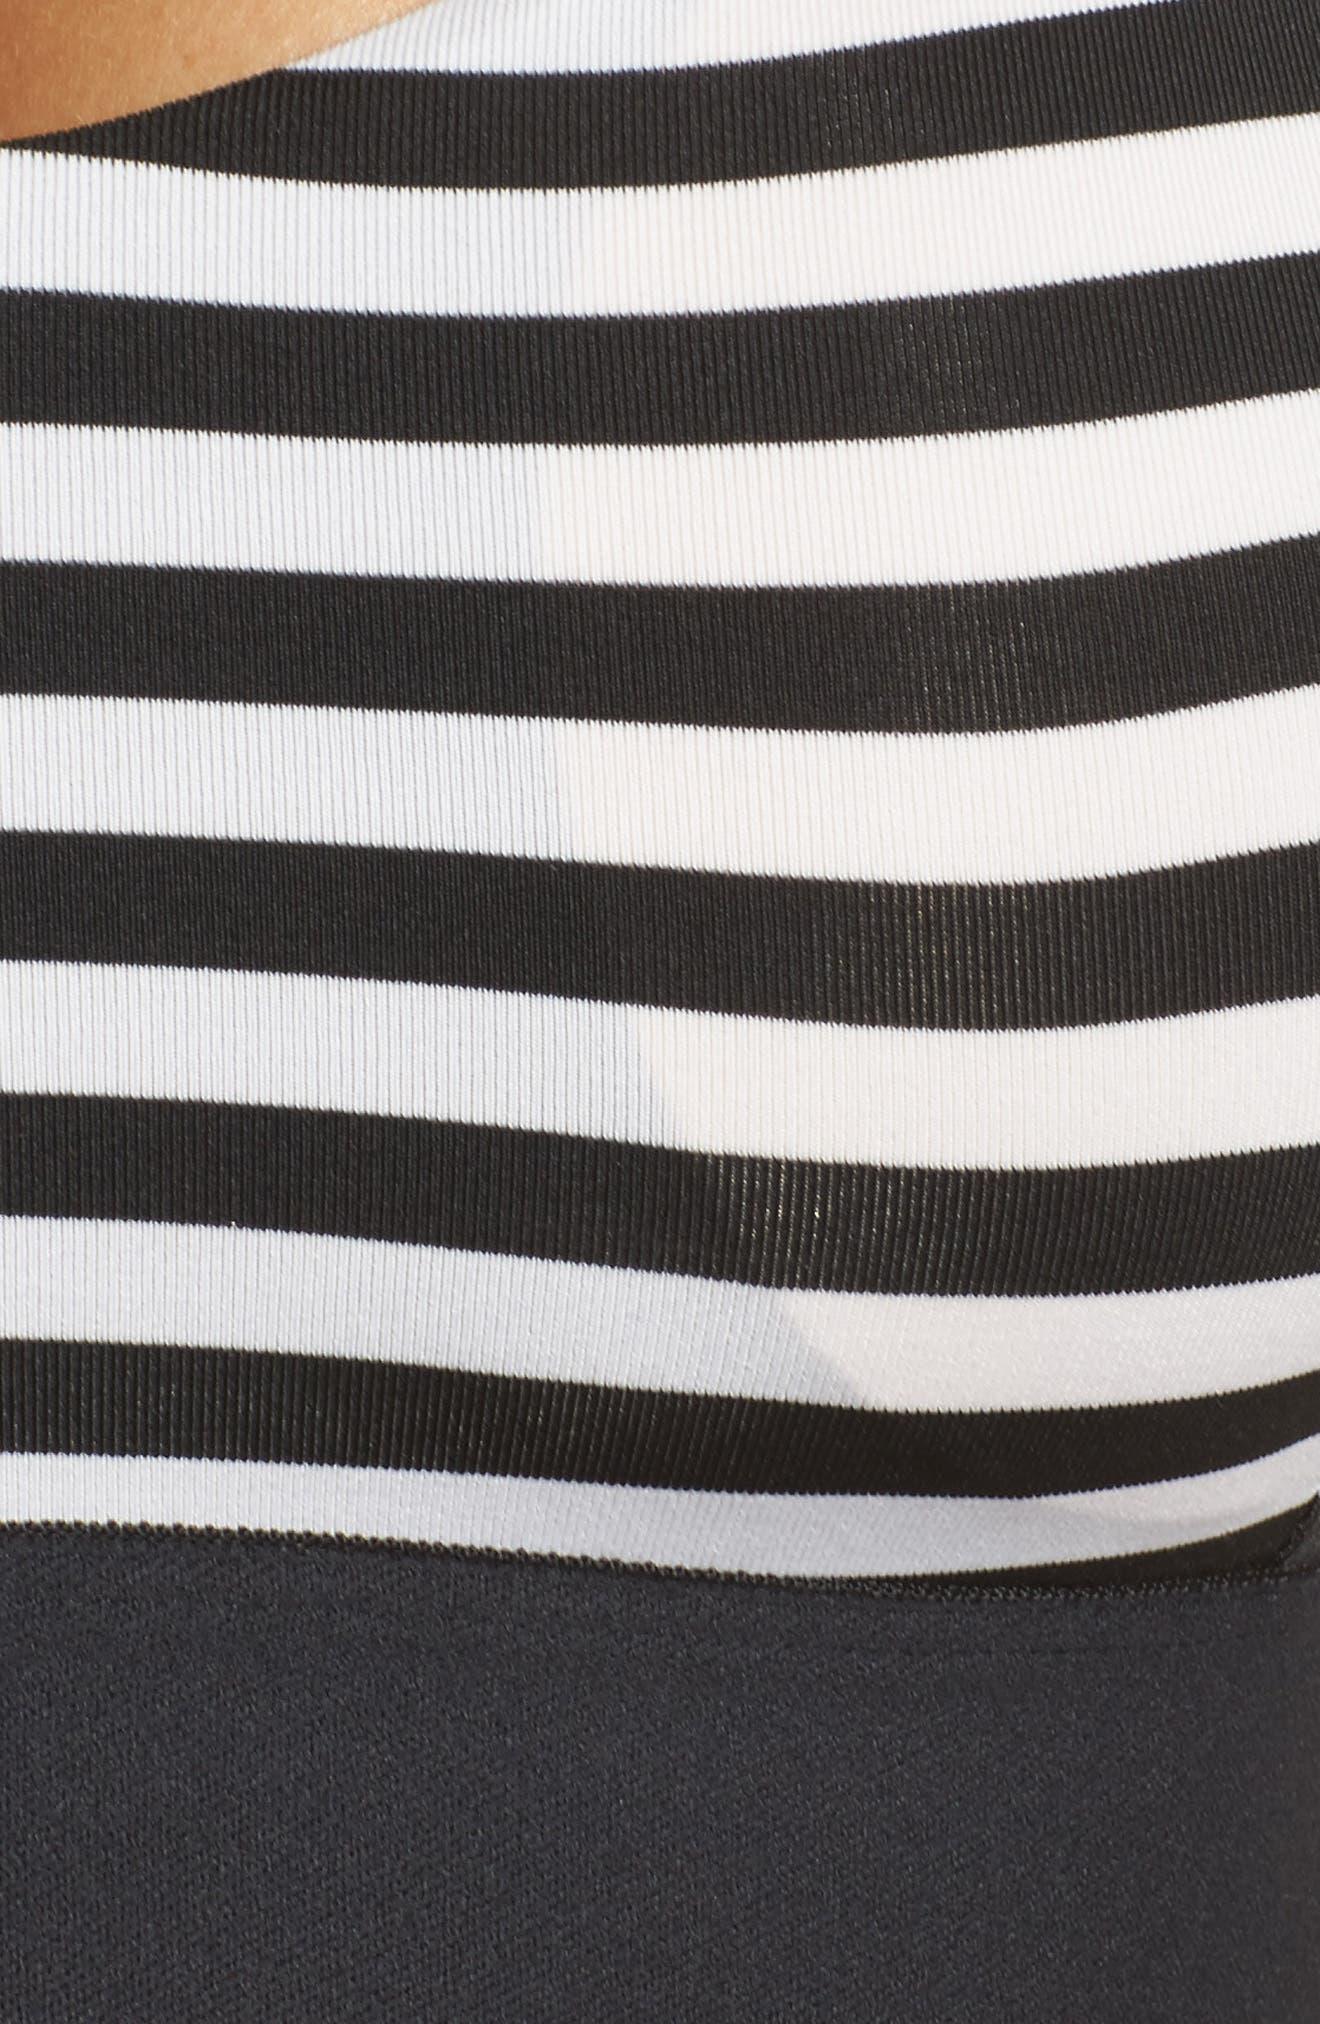 Hot Shot Bra,                             Alternate thumbnail 4, color,                             White/ Black Stripe/ Black